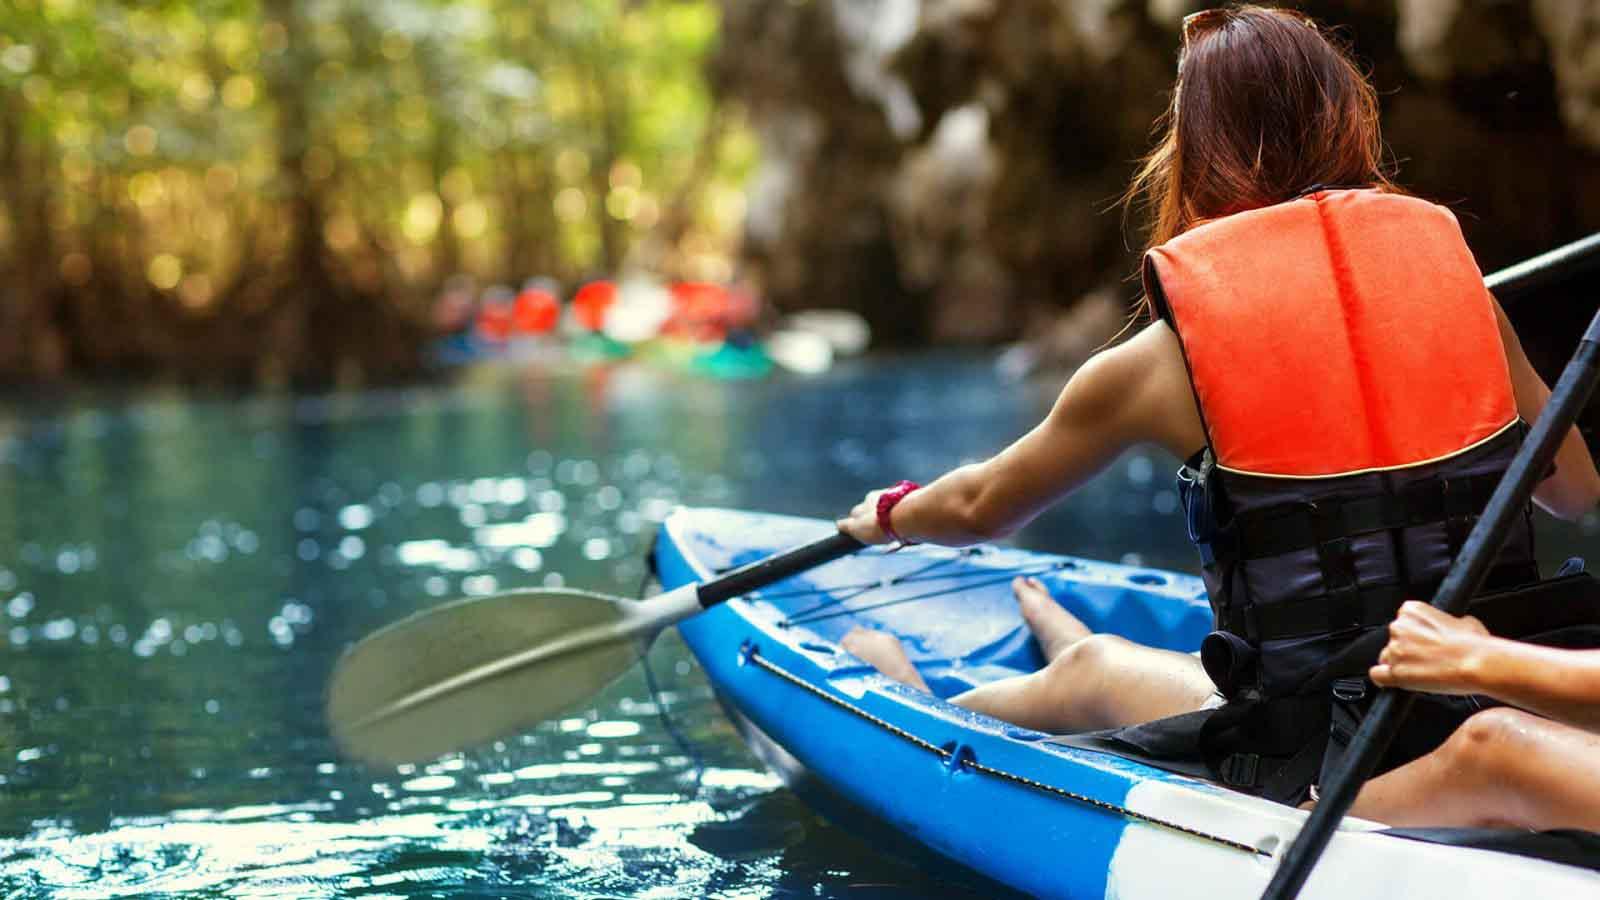 tien ich cheo thuyen kayak1